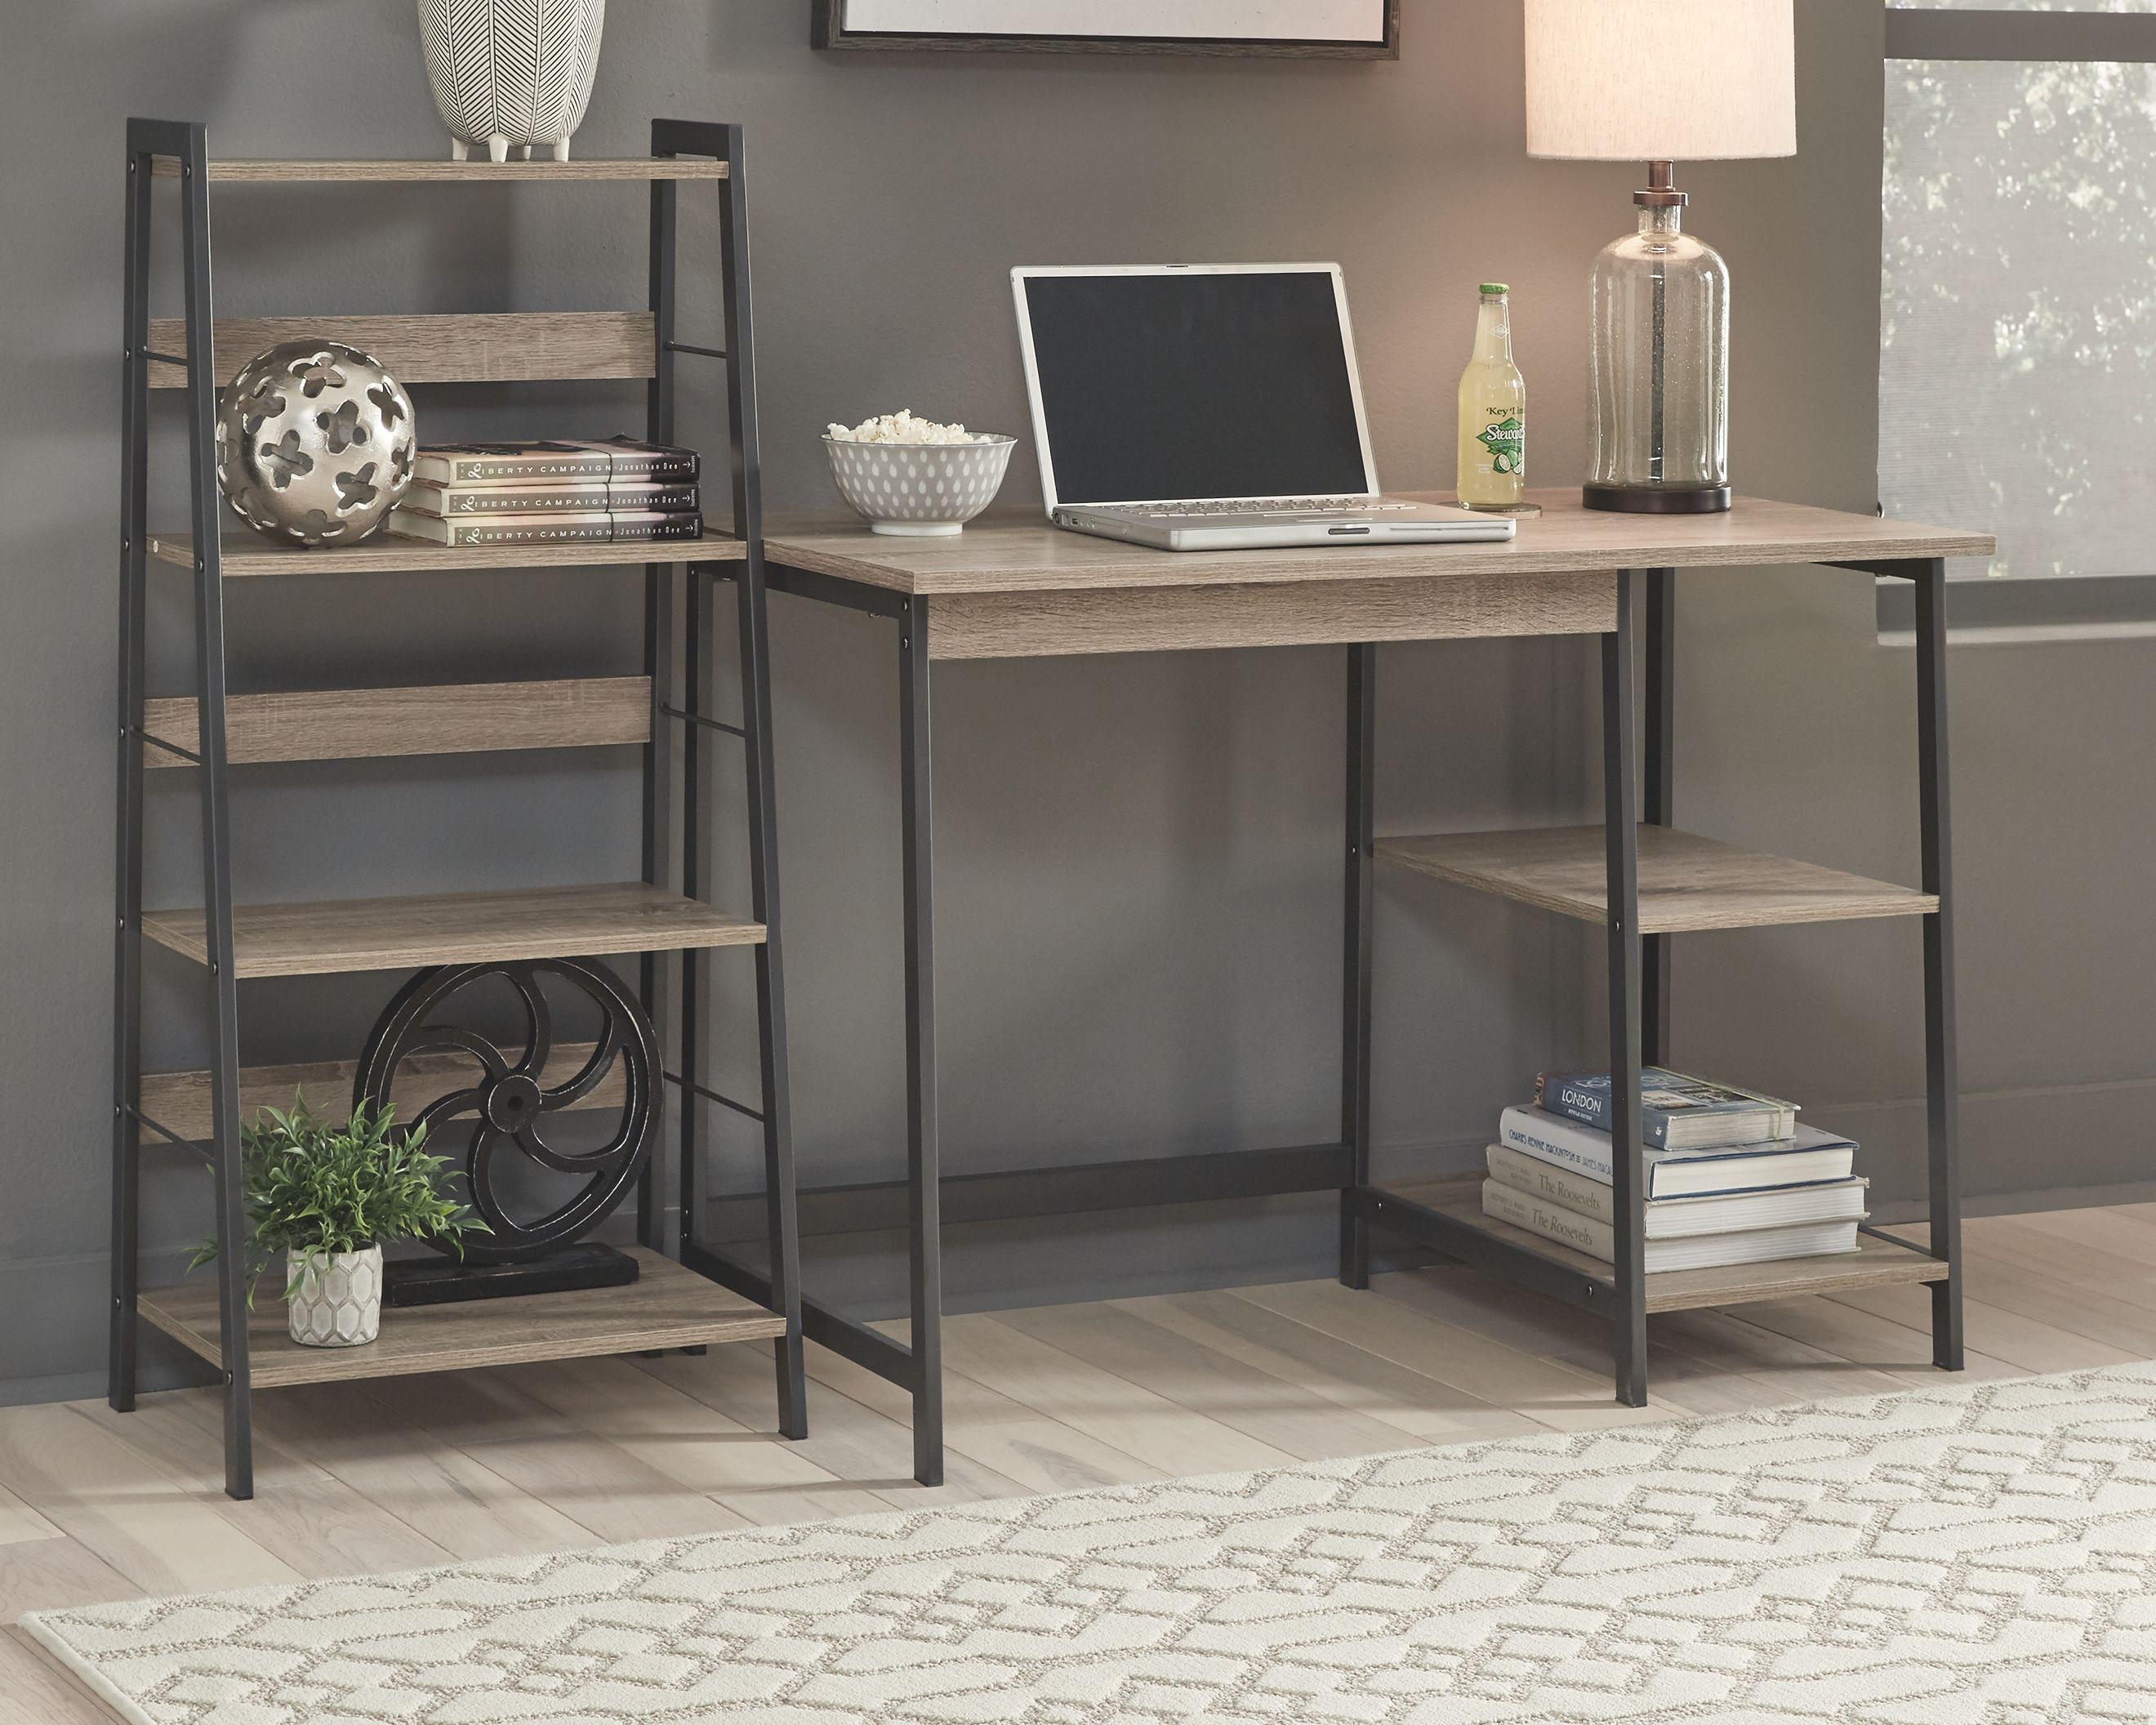 Soho Home Office Desk With Shelf Ashley Furniture Homestore Home Office Desks Sleek Desk Desk Shelves